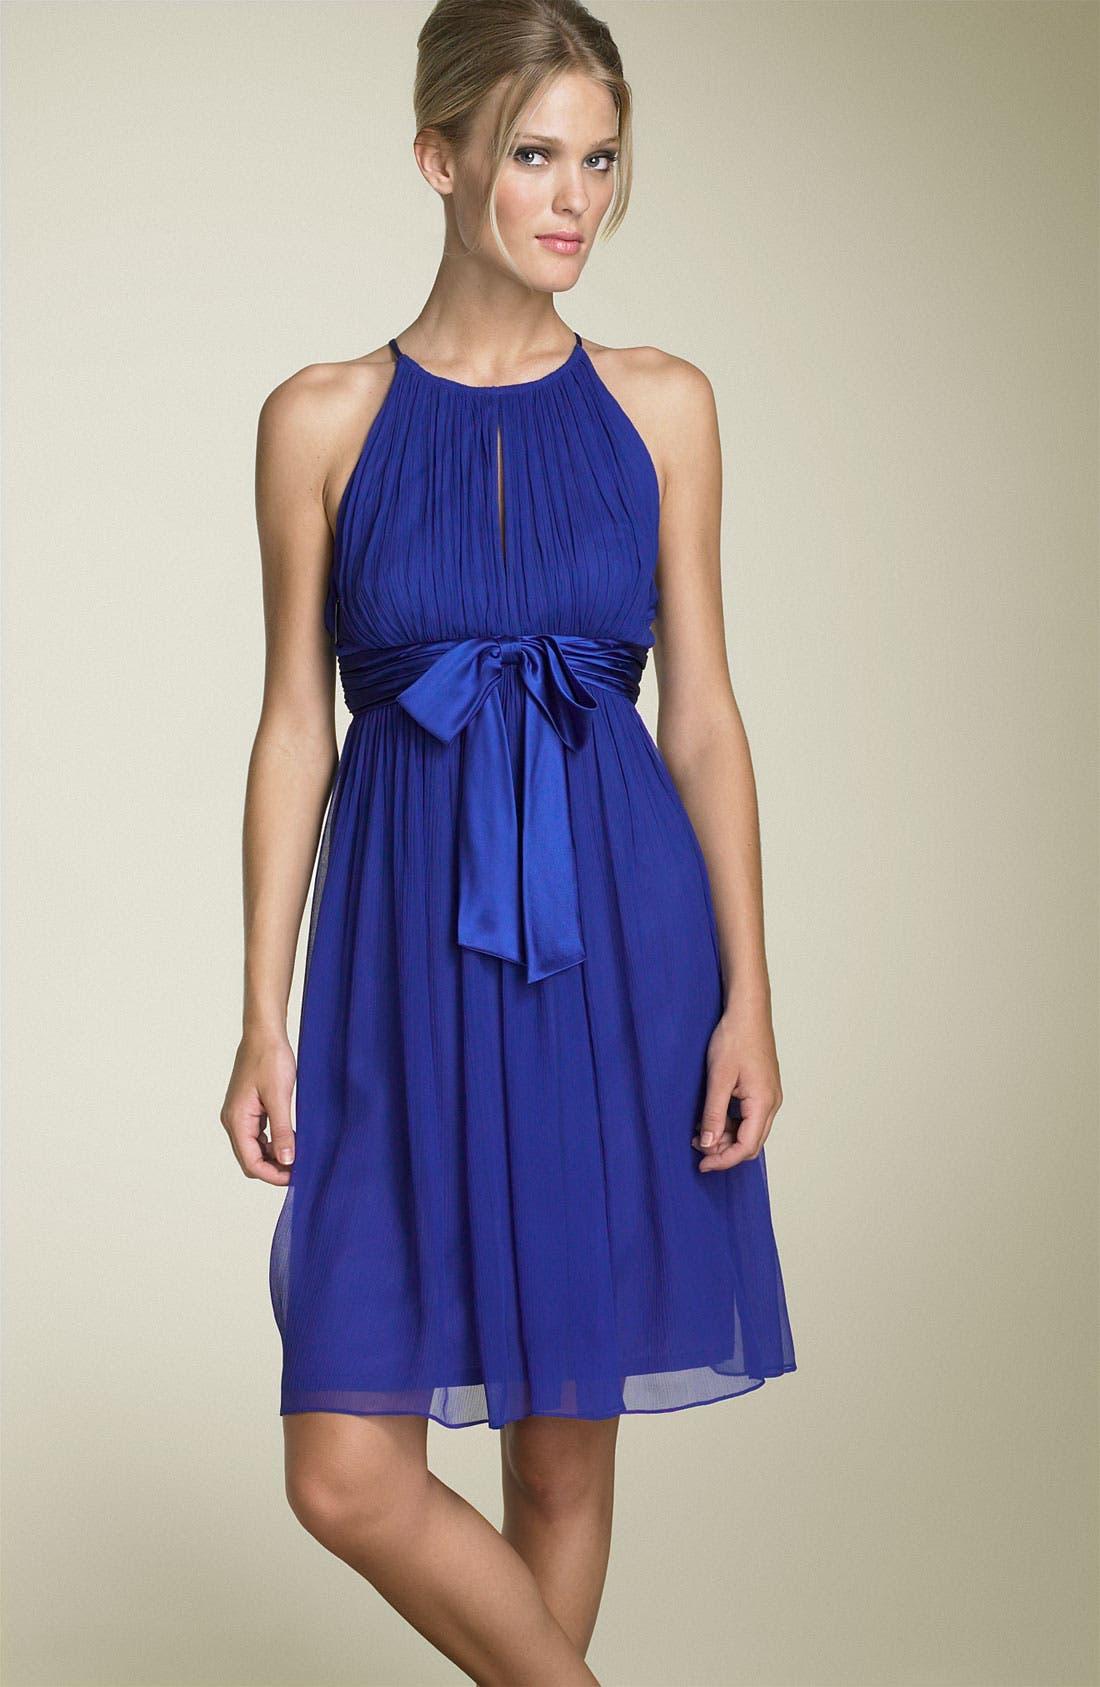 Silk Chiffon Halter Dress,                             Main thumbnail 1, color,                             Tile Blue